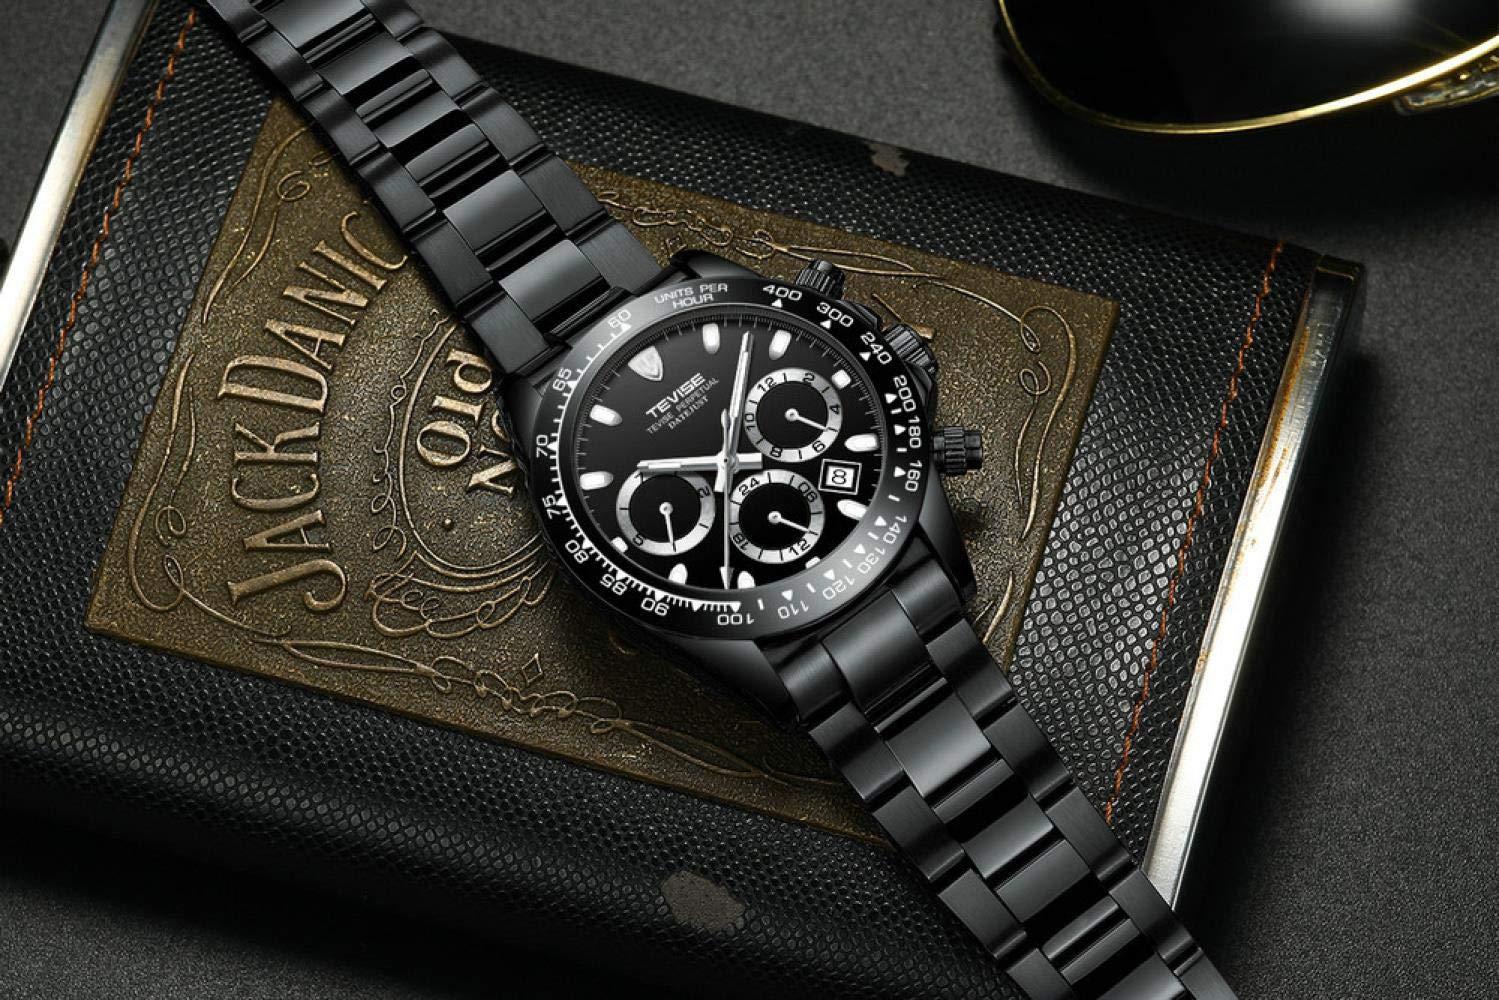 Herrklockor, mekanisk klocka automatisk datum liten tre stift display stålband armbandsur Helt svart